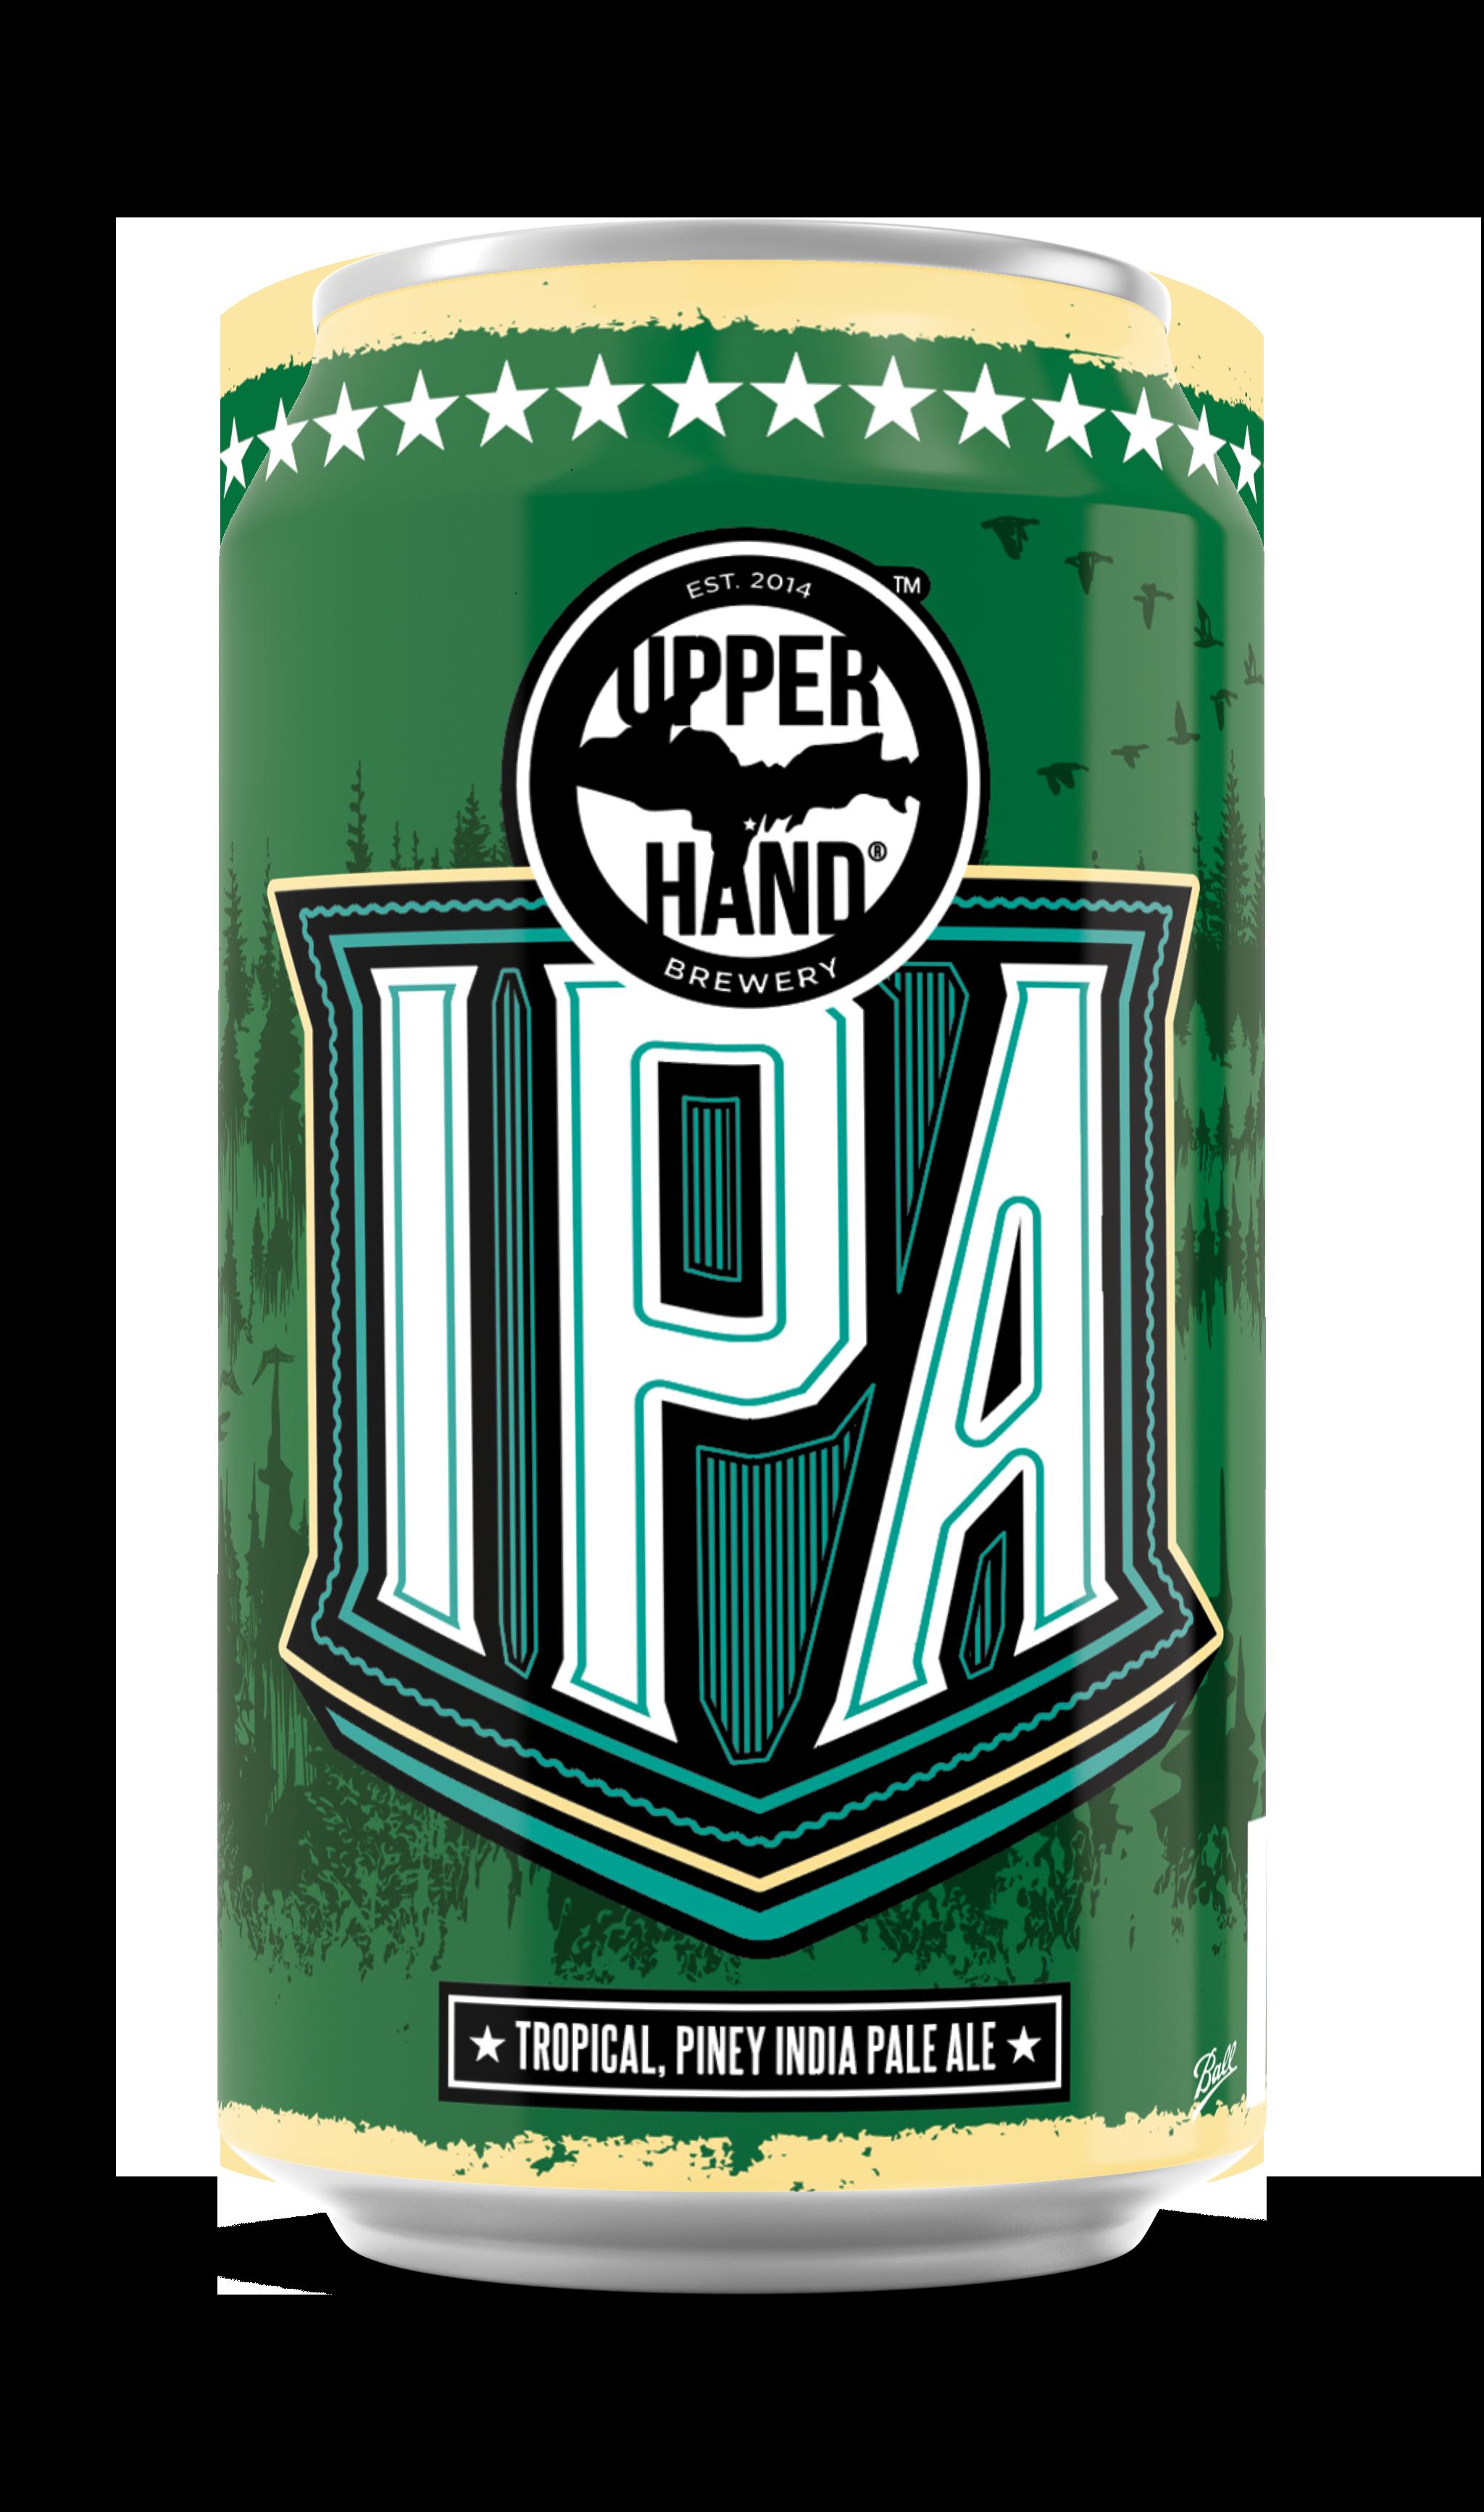 Upper Hand IPA